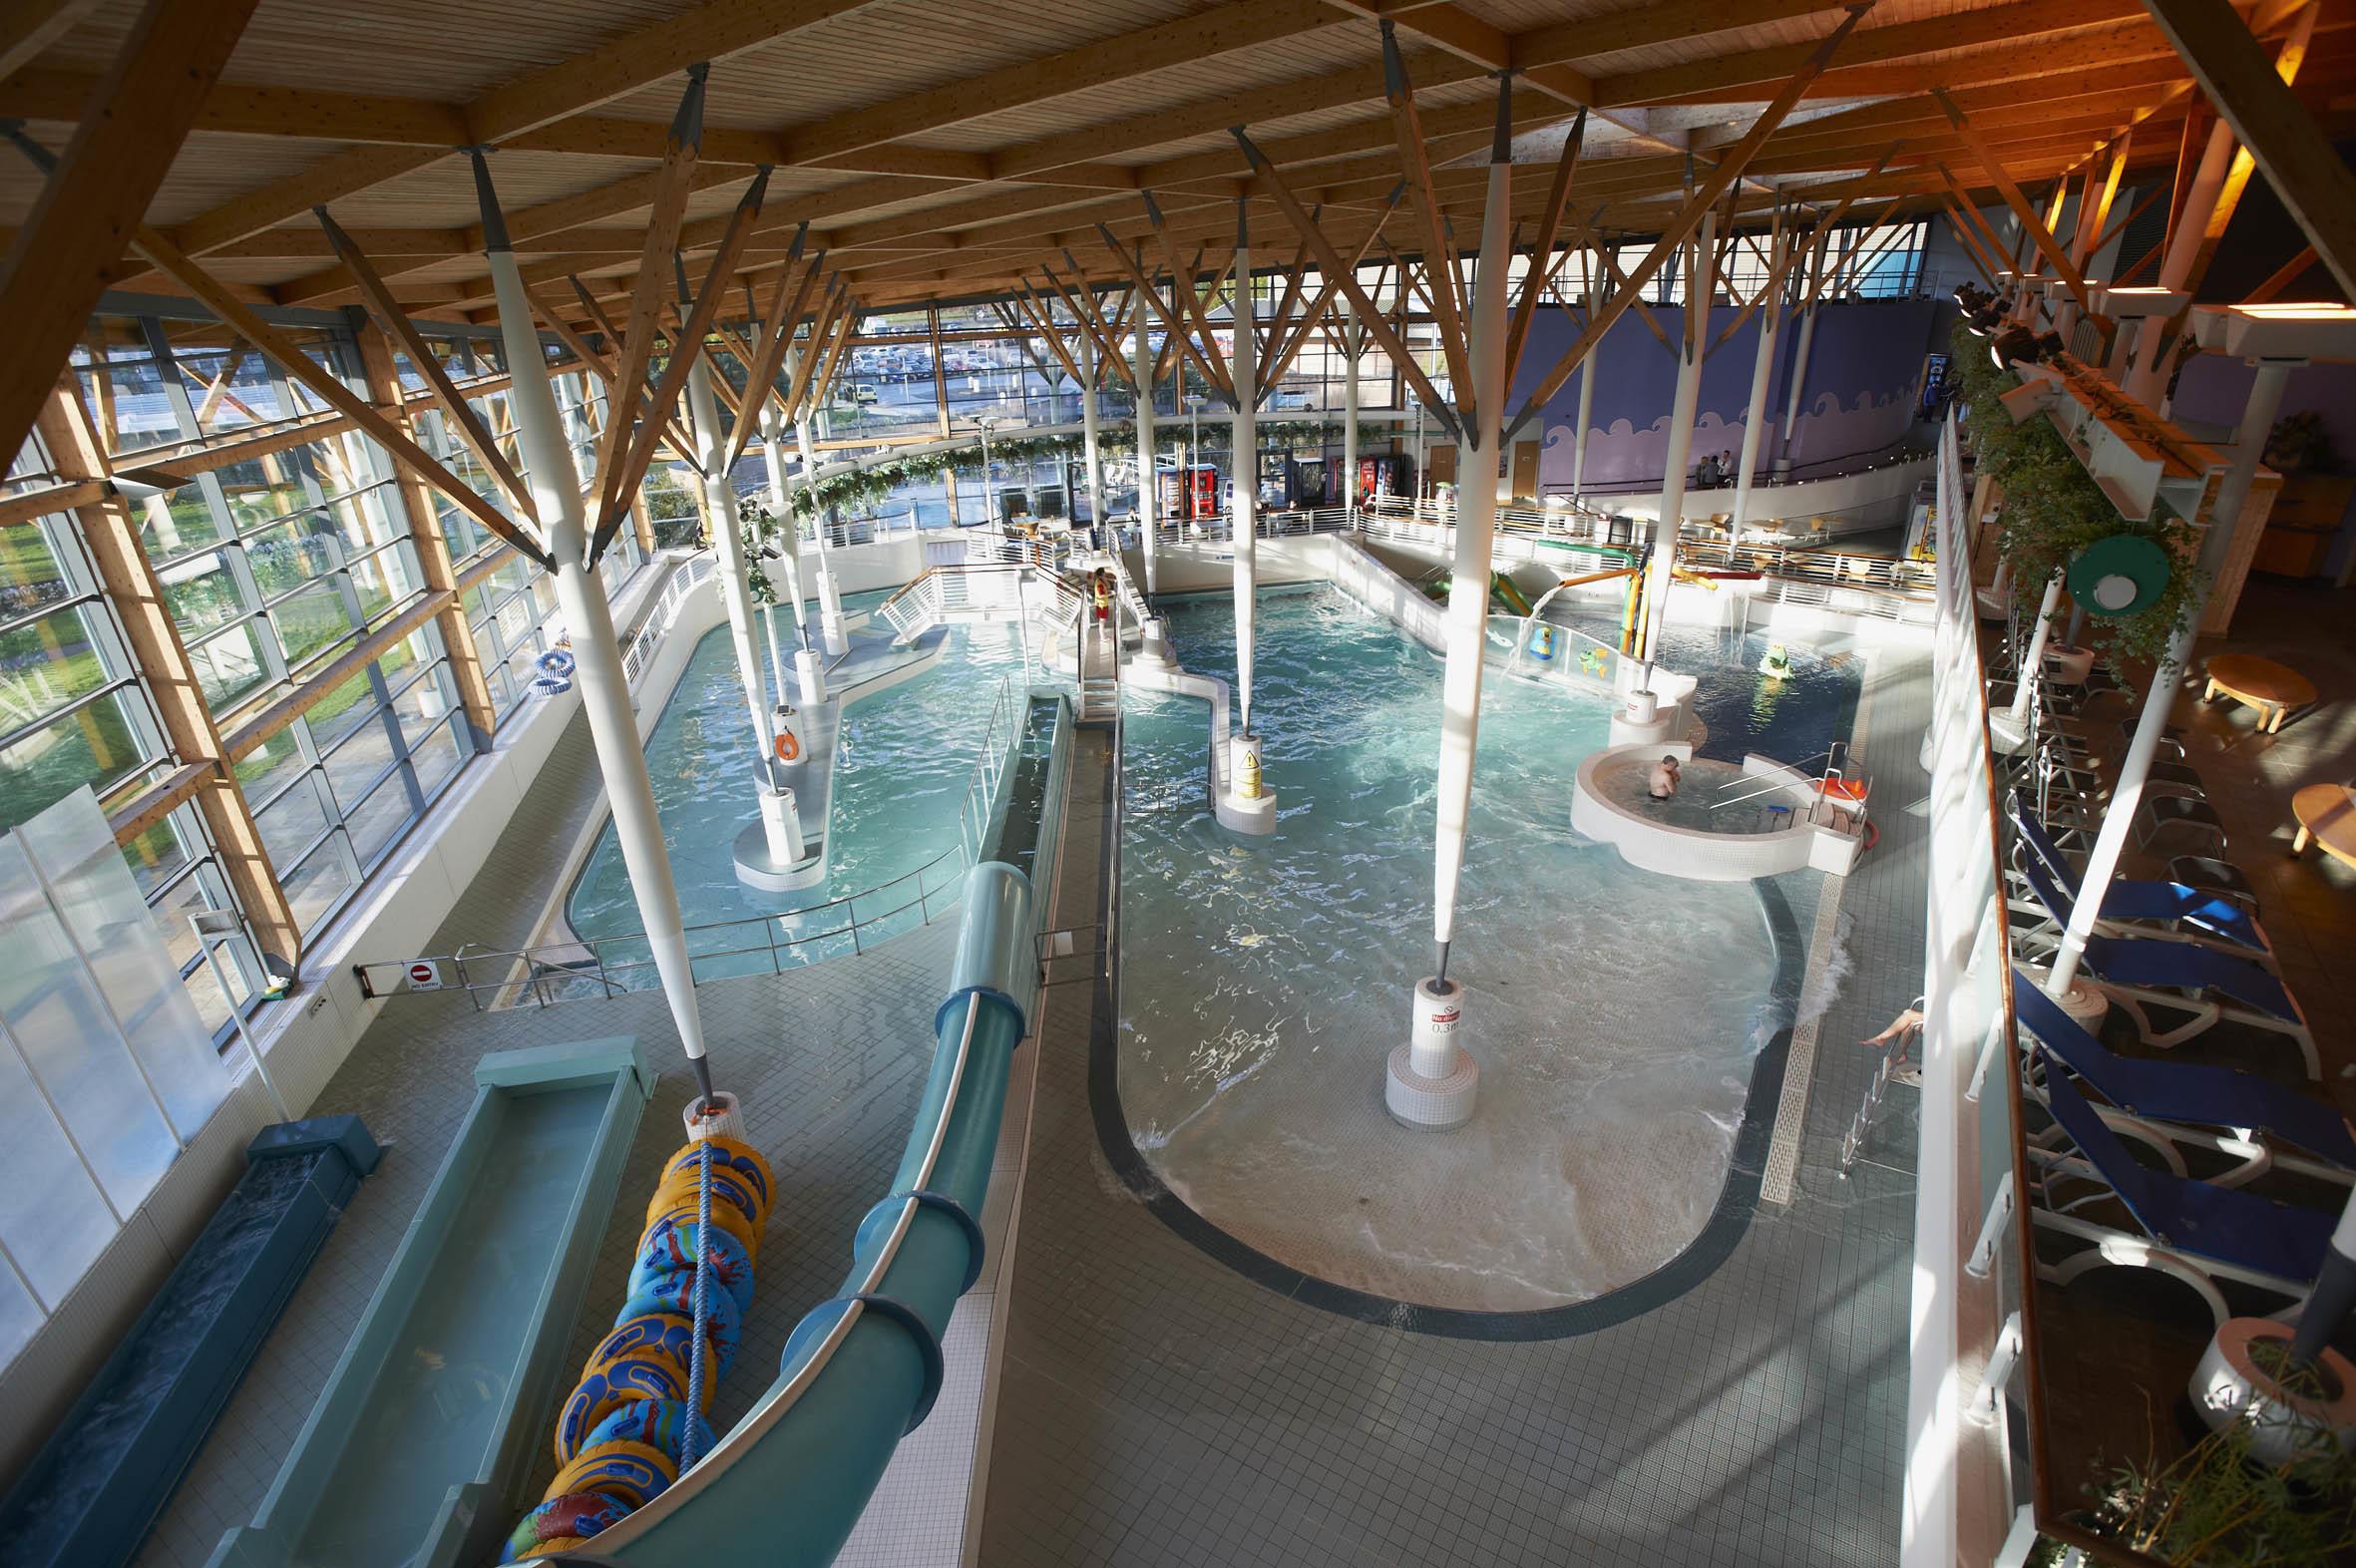 Inverness Aquadome